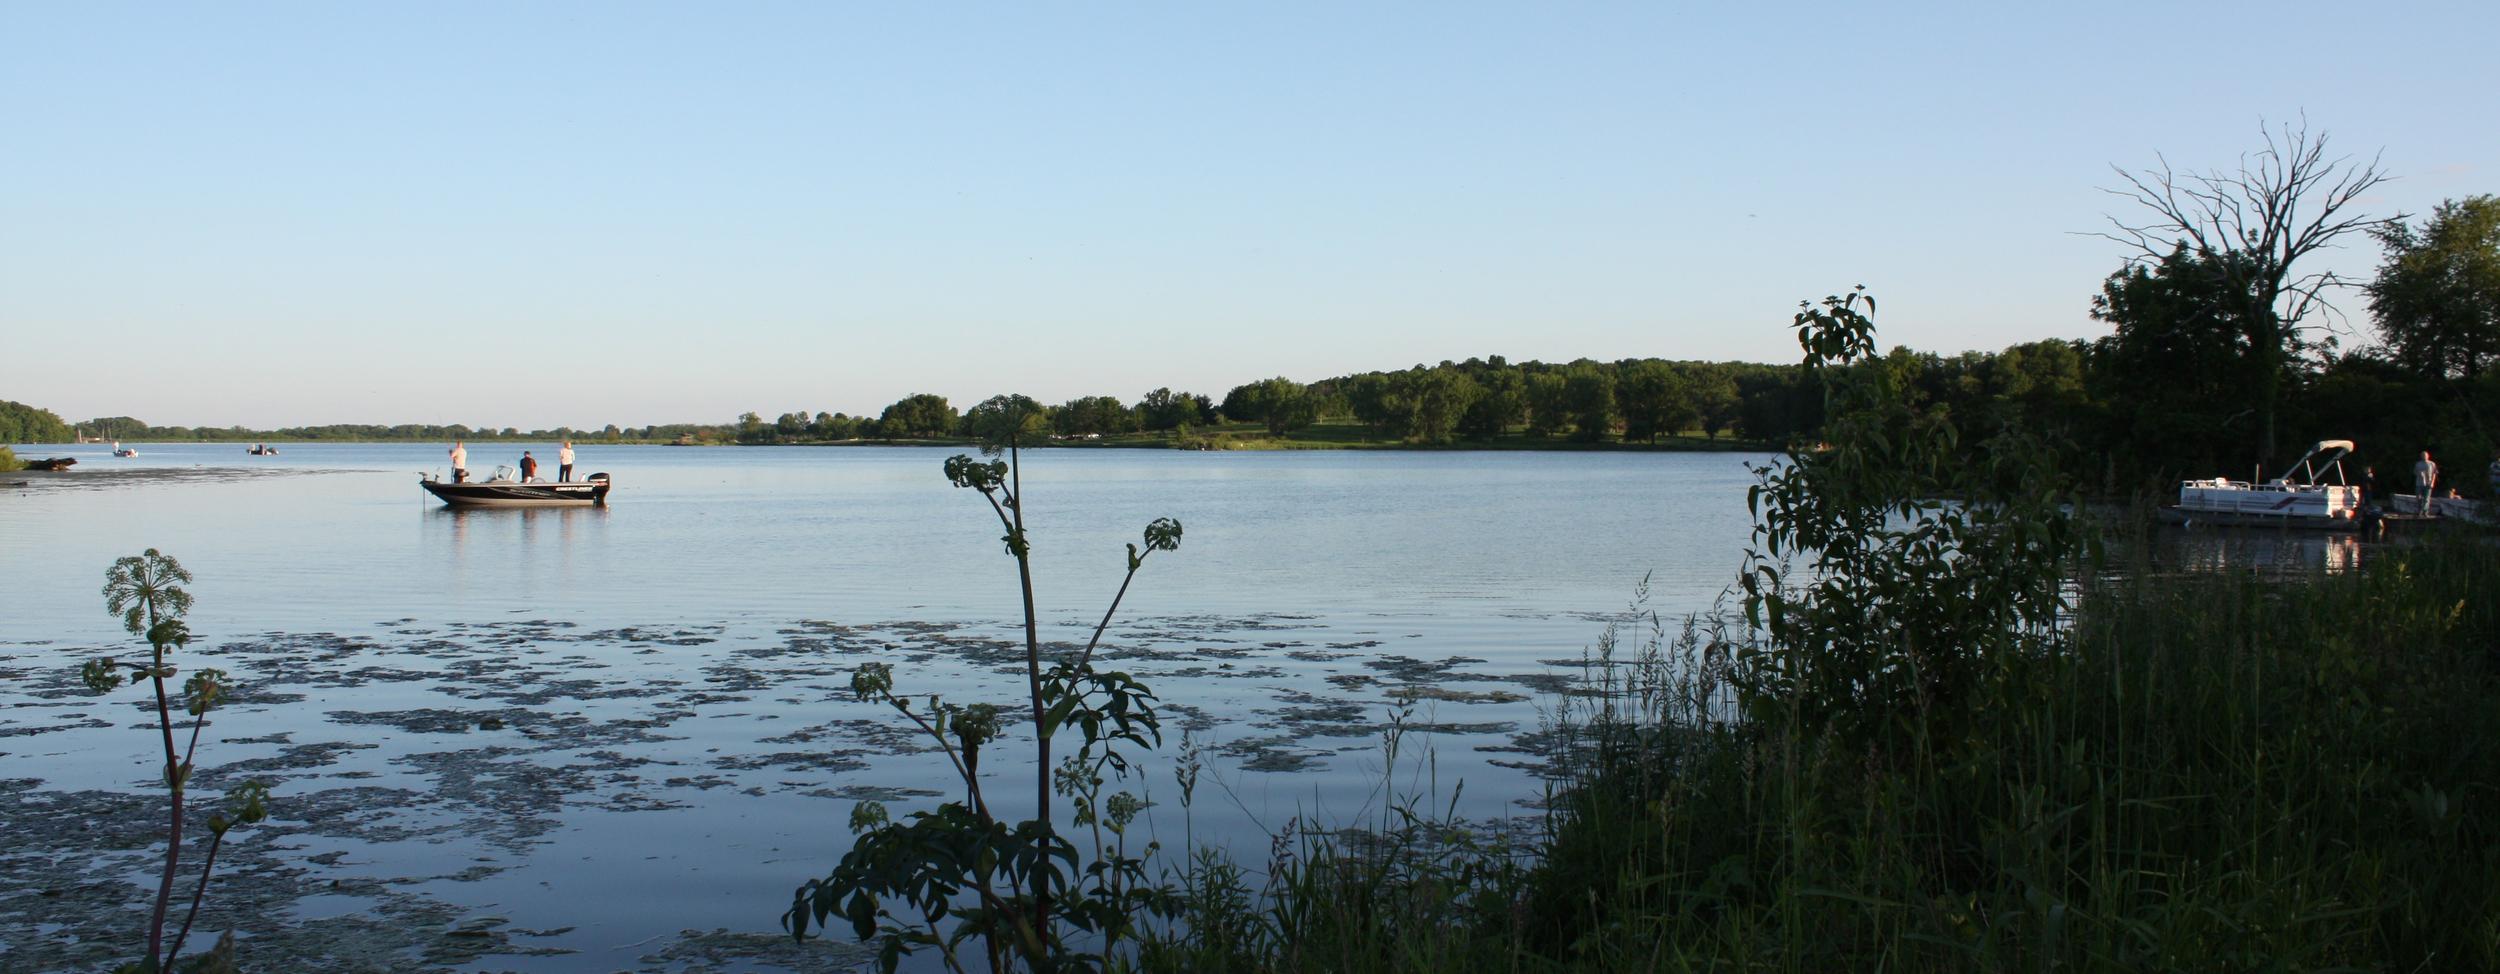 BEAUTIFUL - NATURAL - SHABBONA LAKE STATE PARK